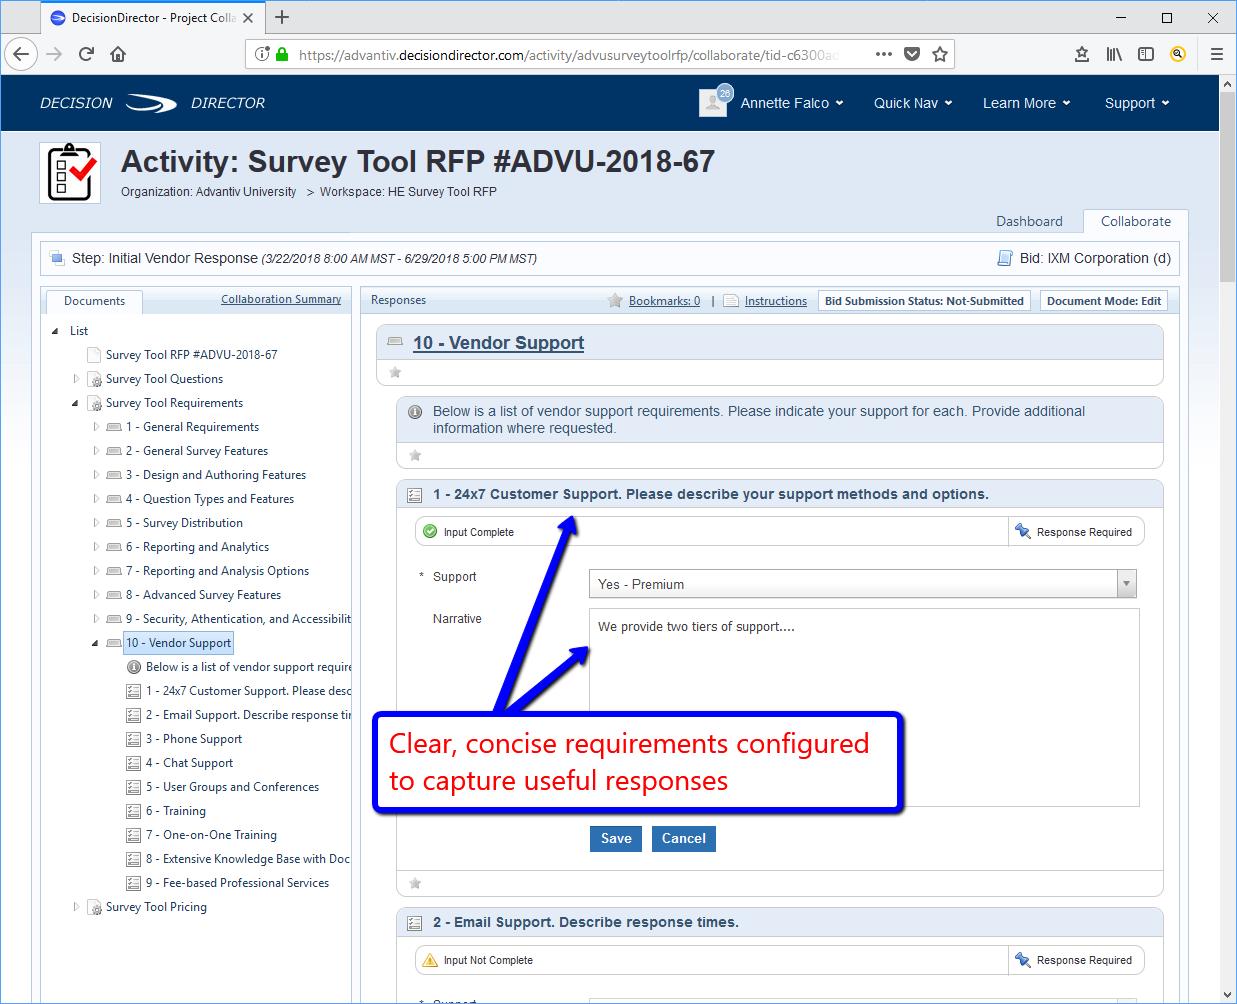 RFP Hosting - Advantiv DecisionDirector